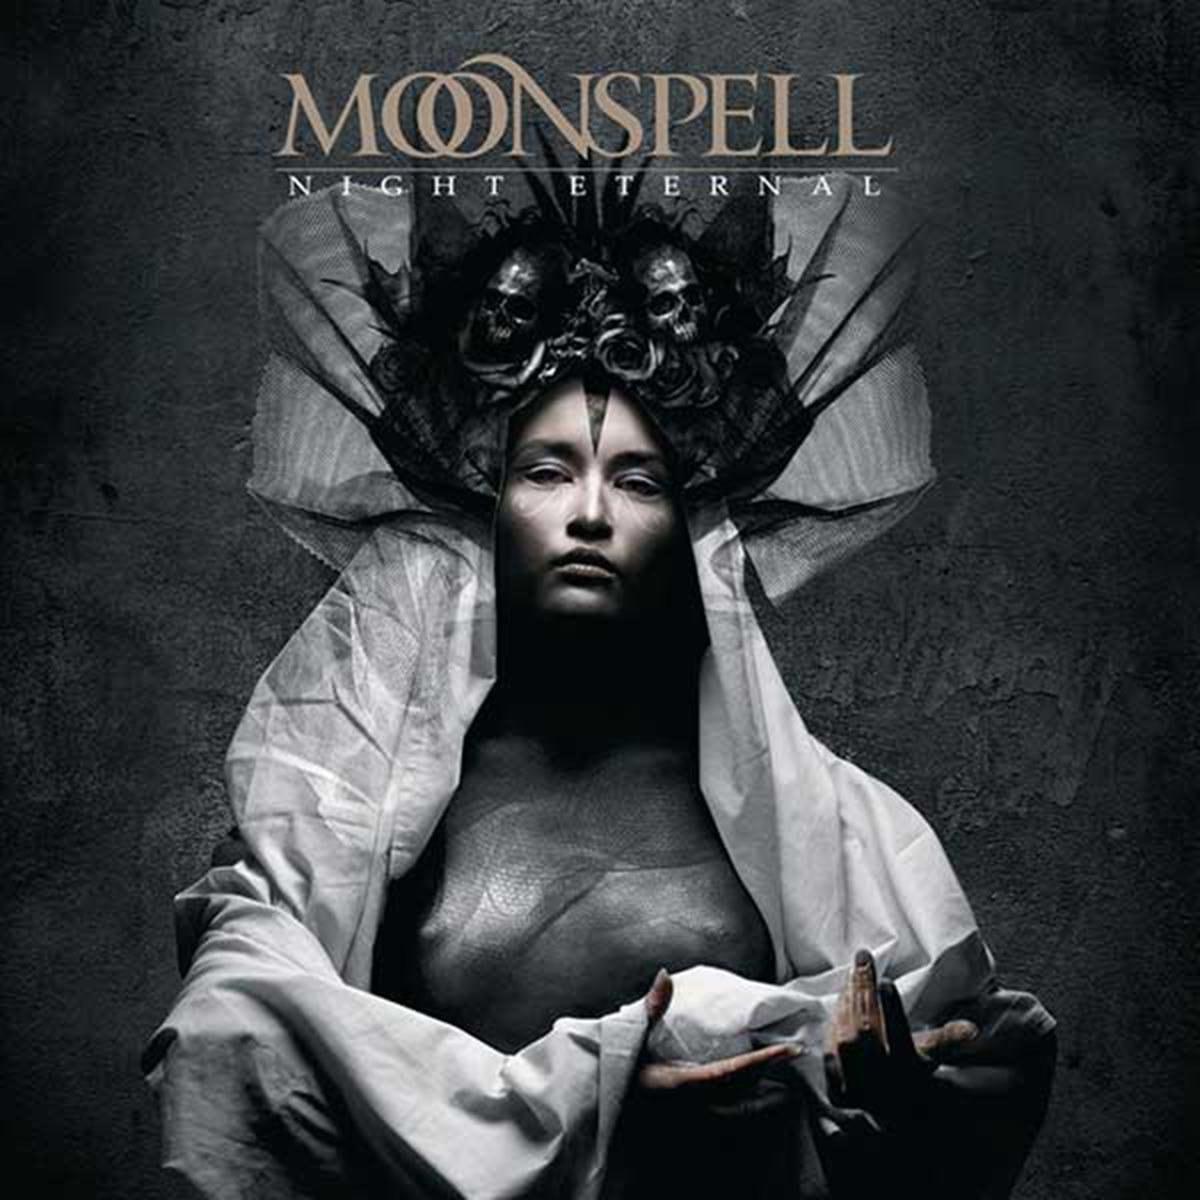 Reviews for Moonspell - Night Eternal